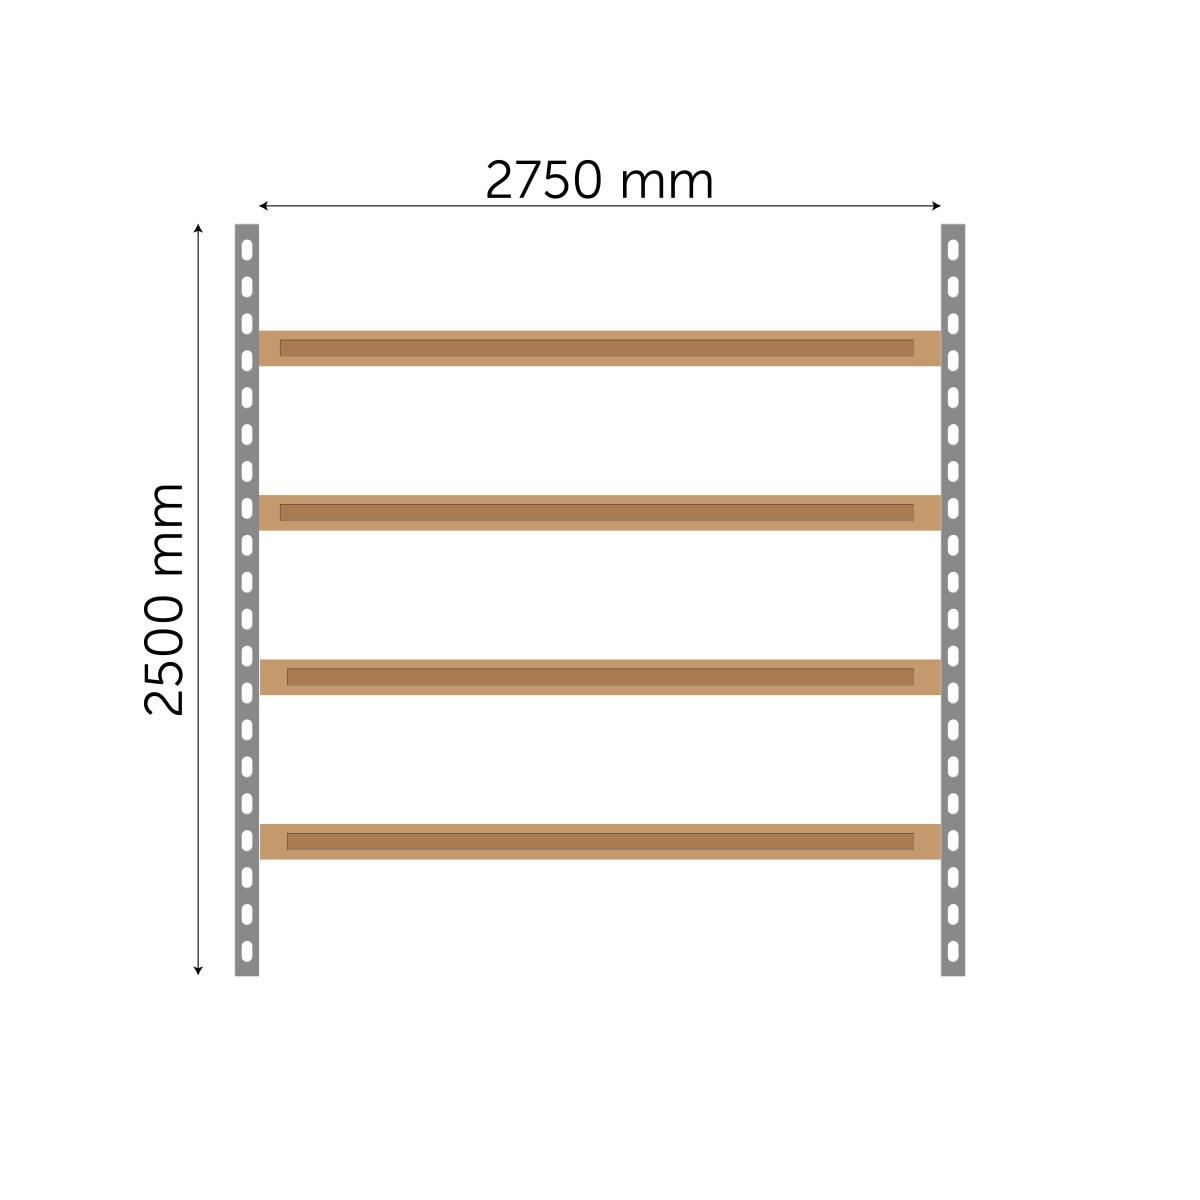 Meediumriiuli põhiosa 2500x2750mm